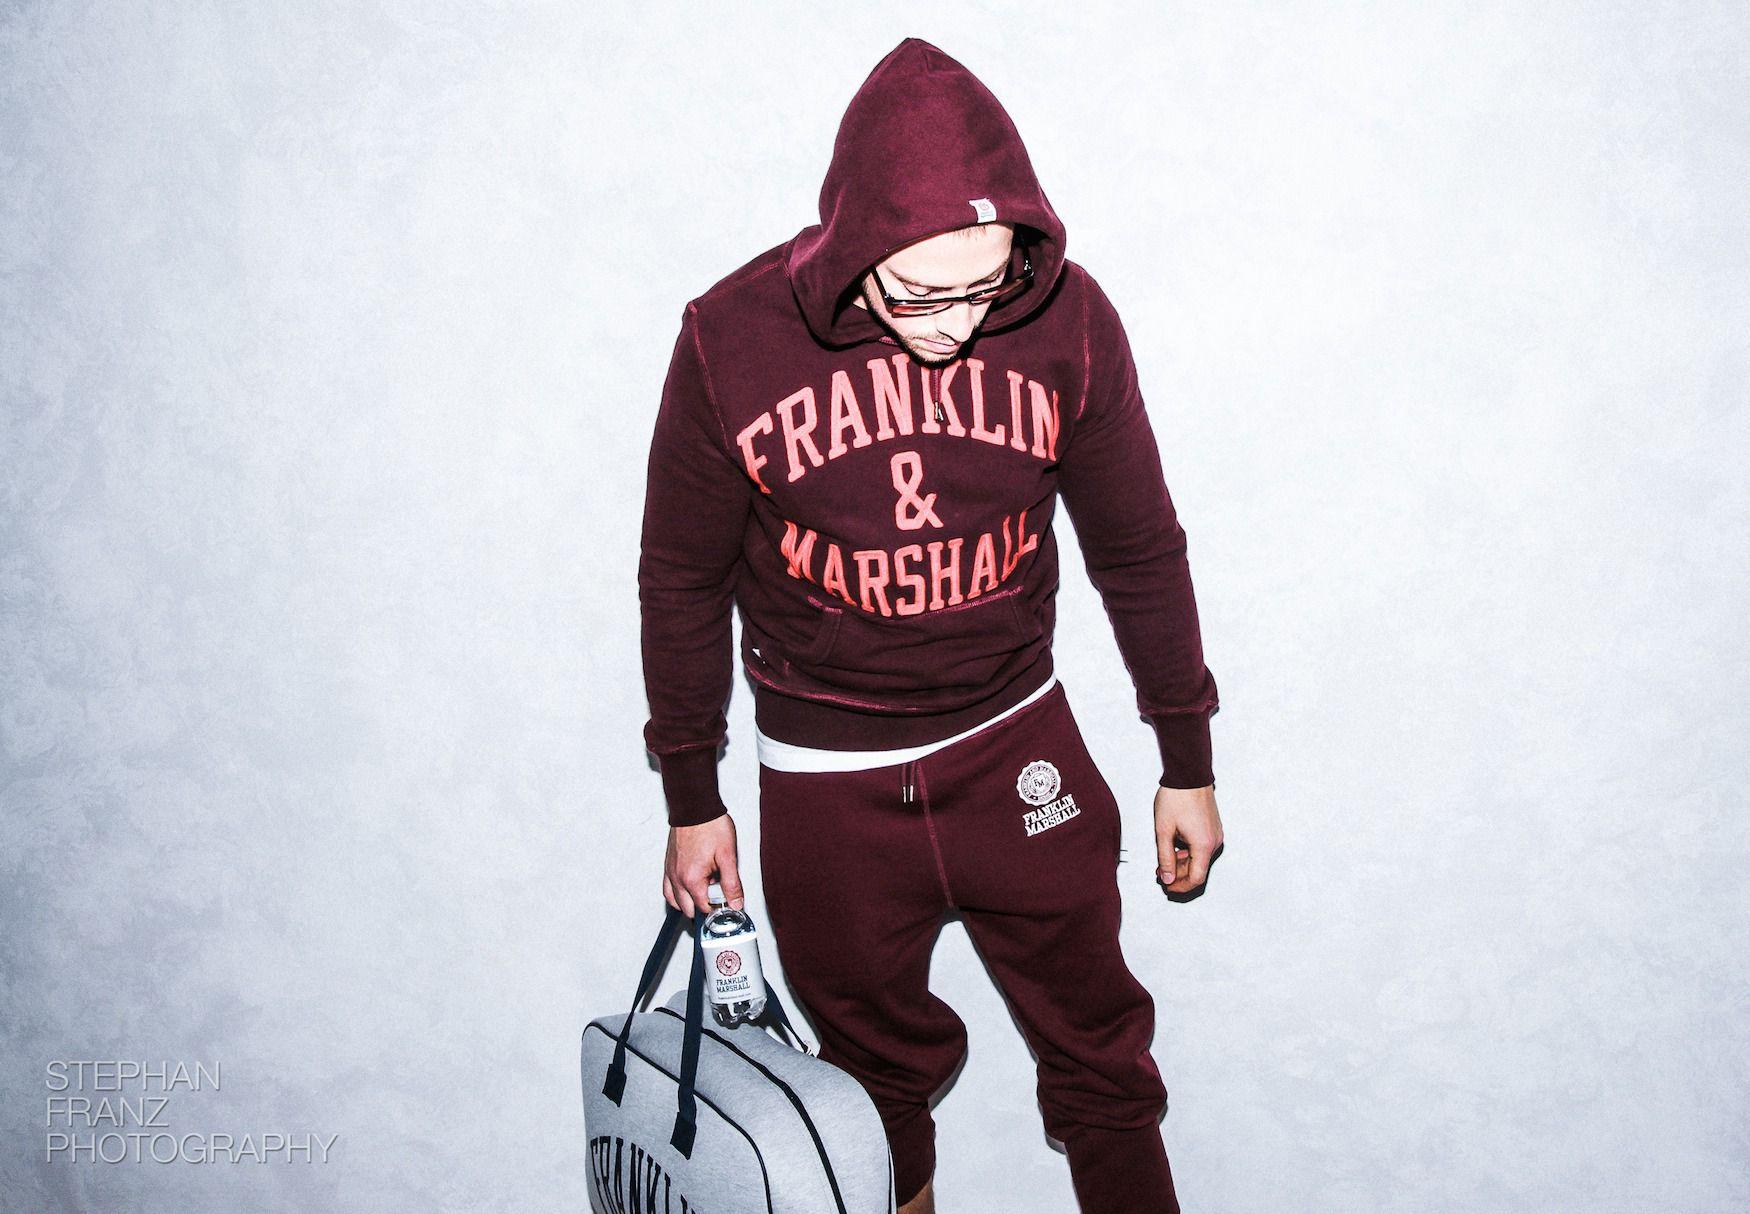 franklin marshall oktober 2013-40 - Stephan Franz Photography